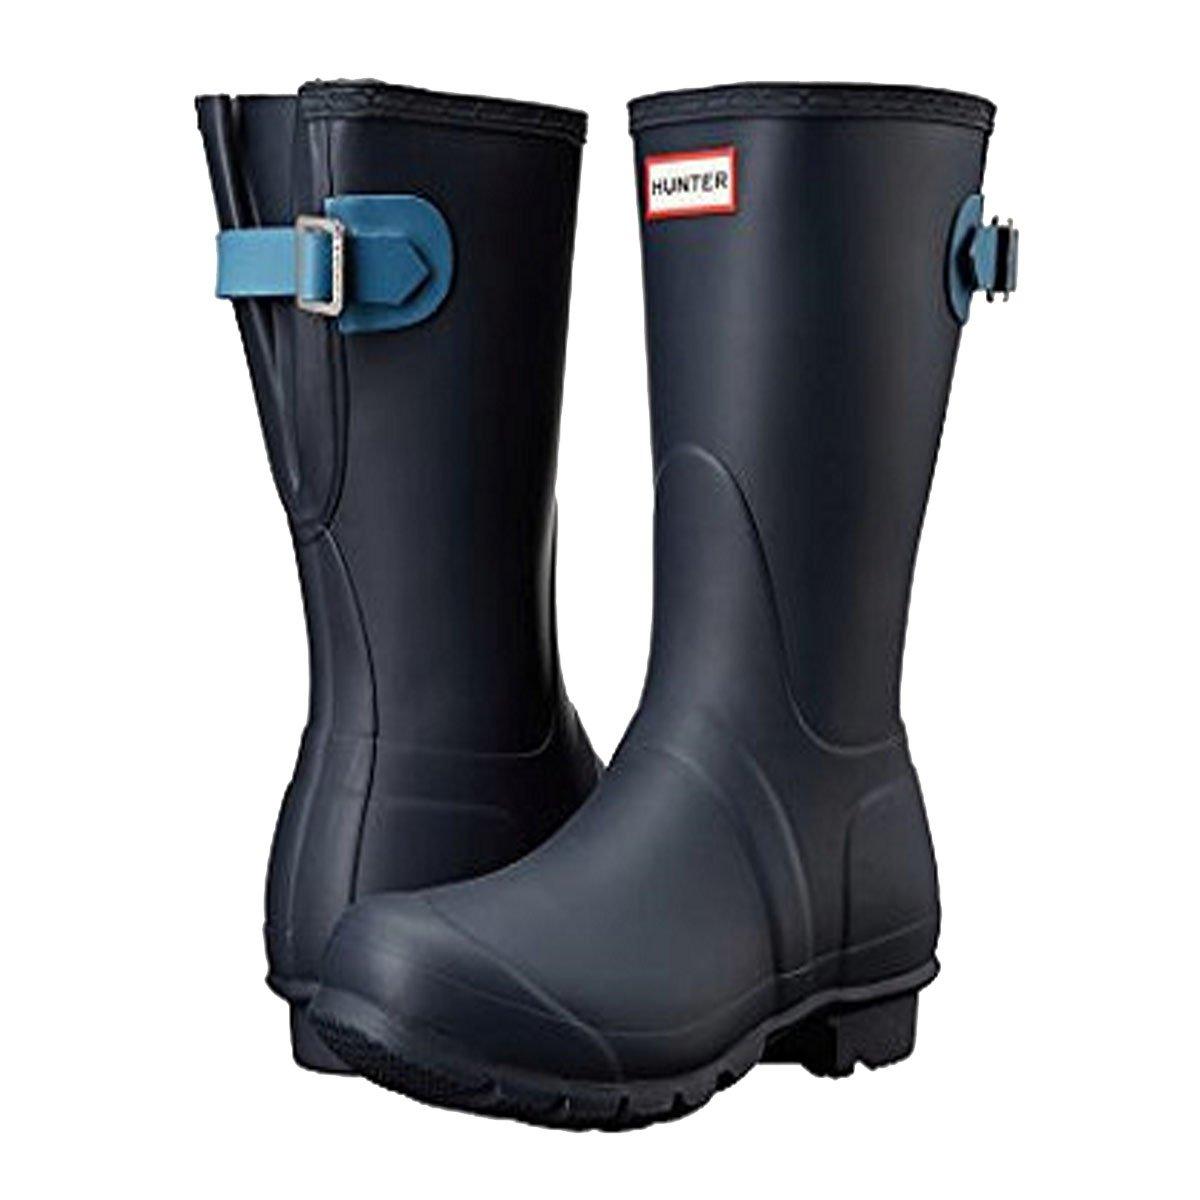 Hunter Original Back Adjustable Short Navy/Pale Air Force Women's Rain Boots